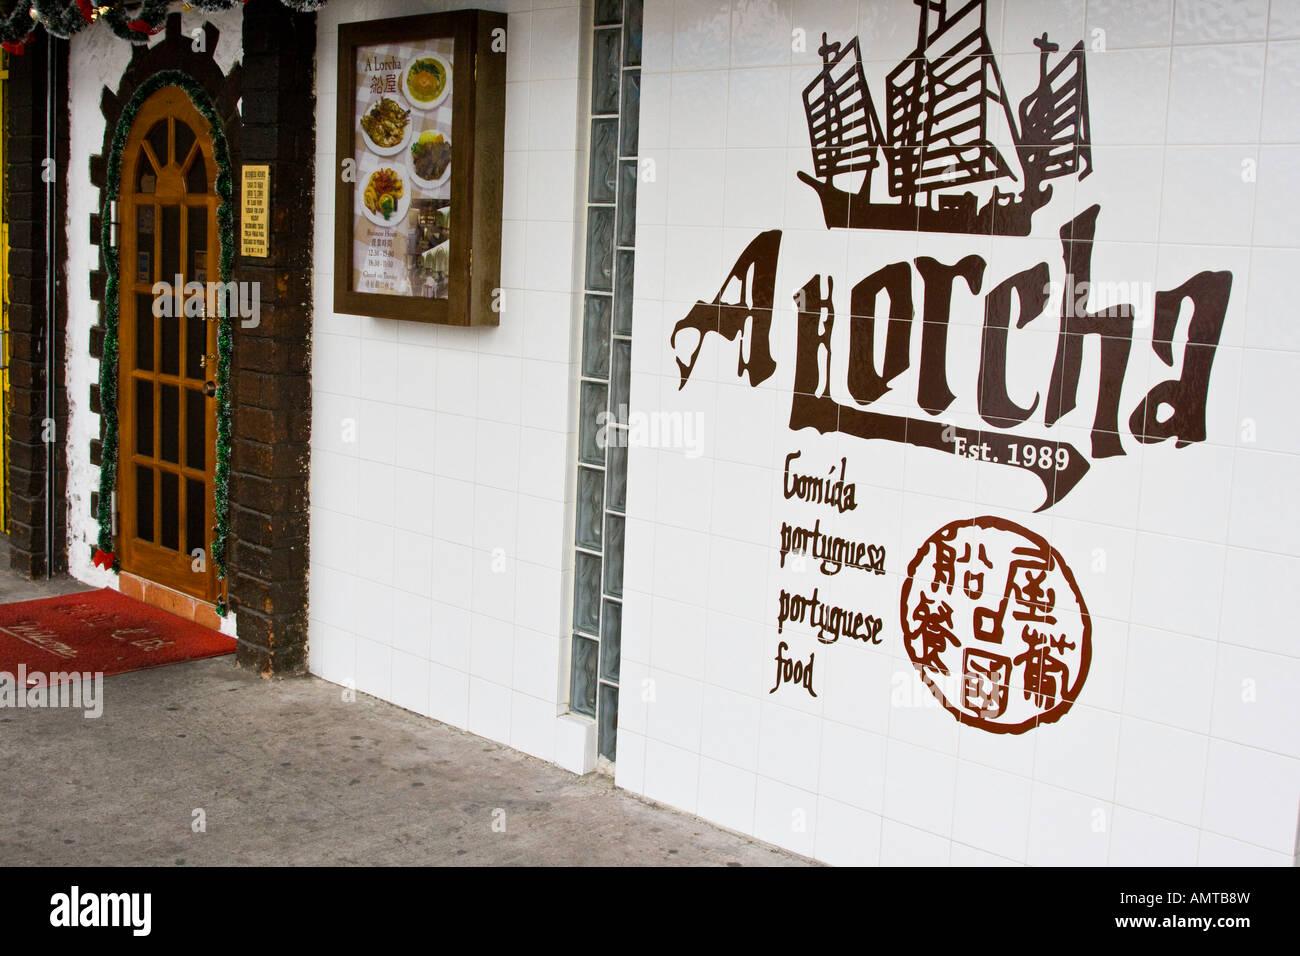 Macau Restaurant Stock Photos & Macau Restaurant Stock Images - Page ...